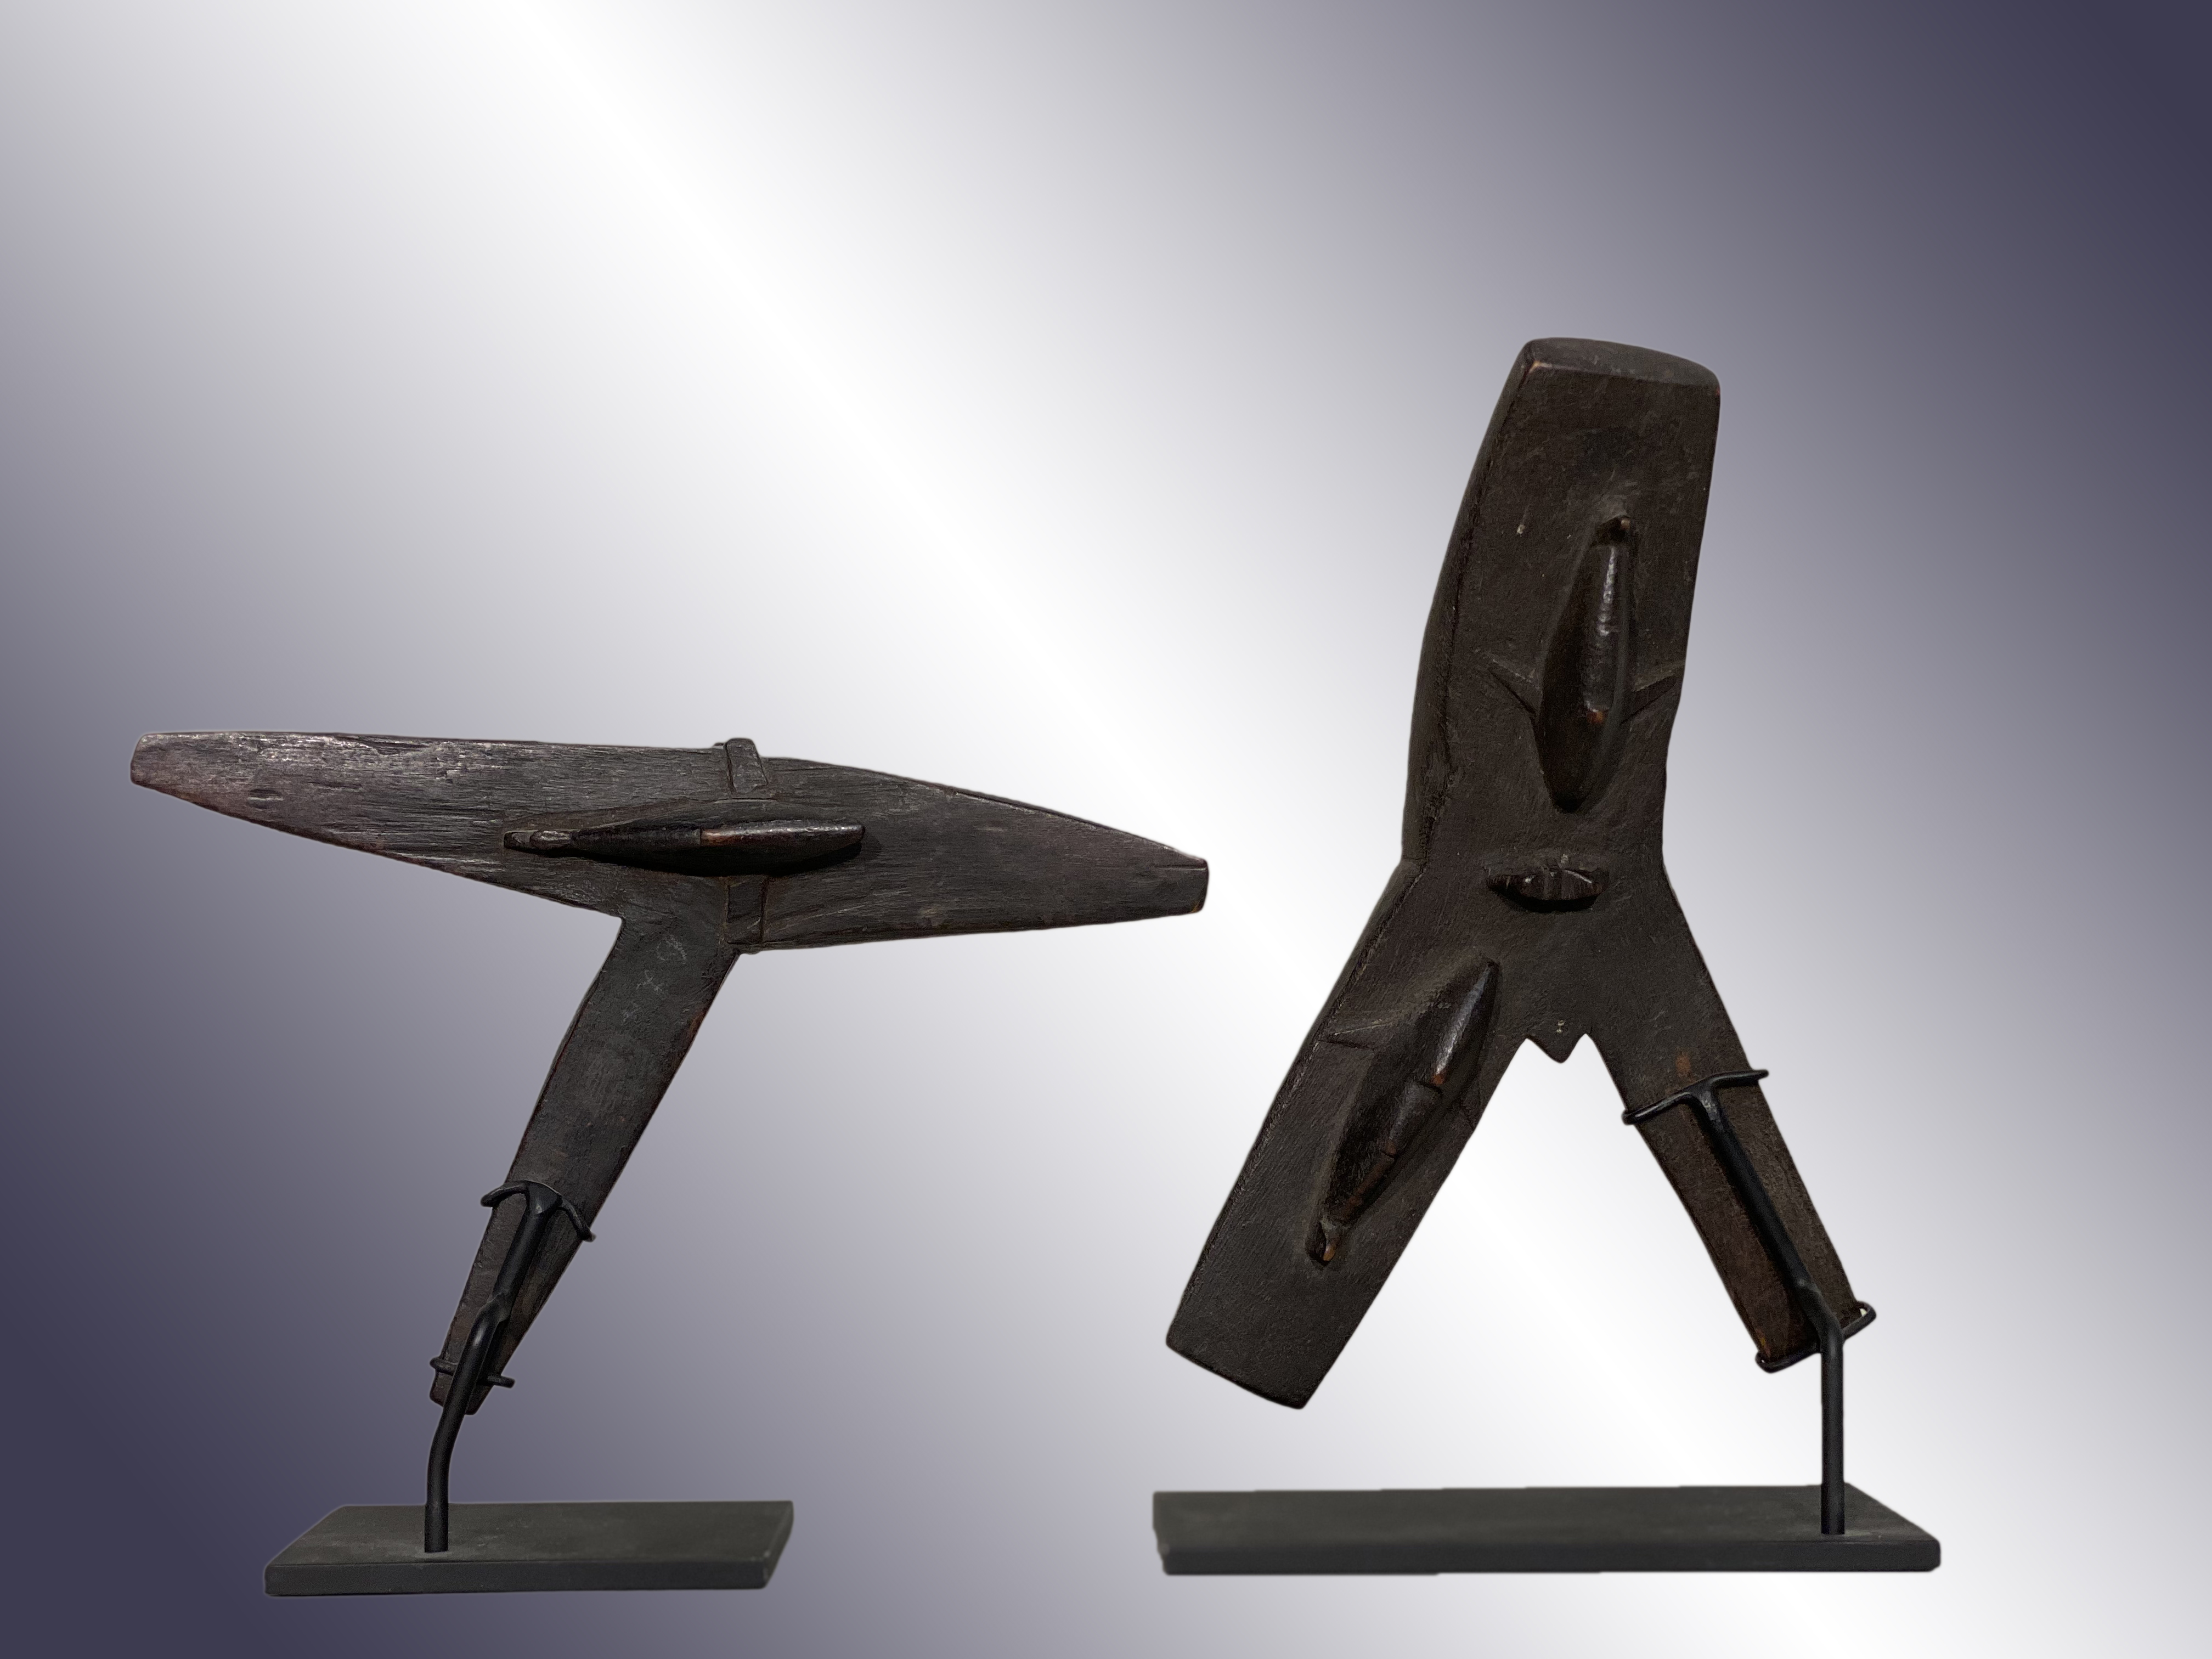 Two Santa Cruz Wooden Stretchers